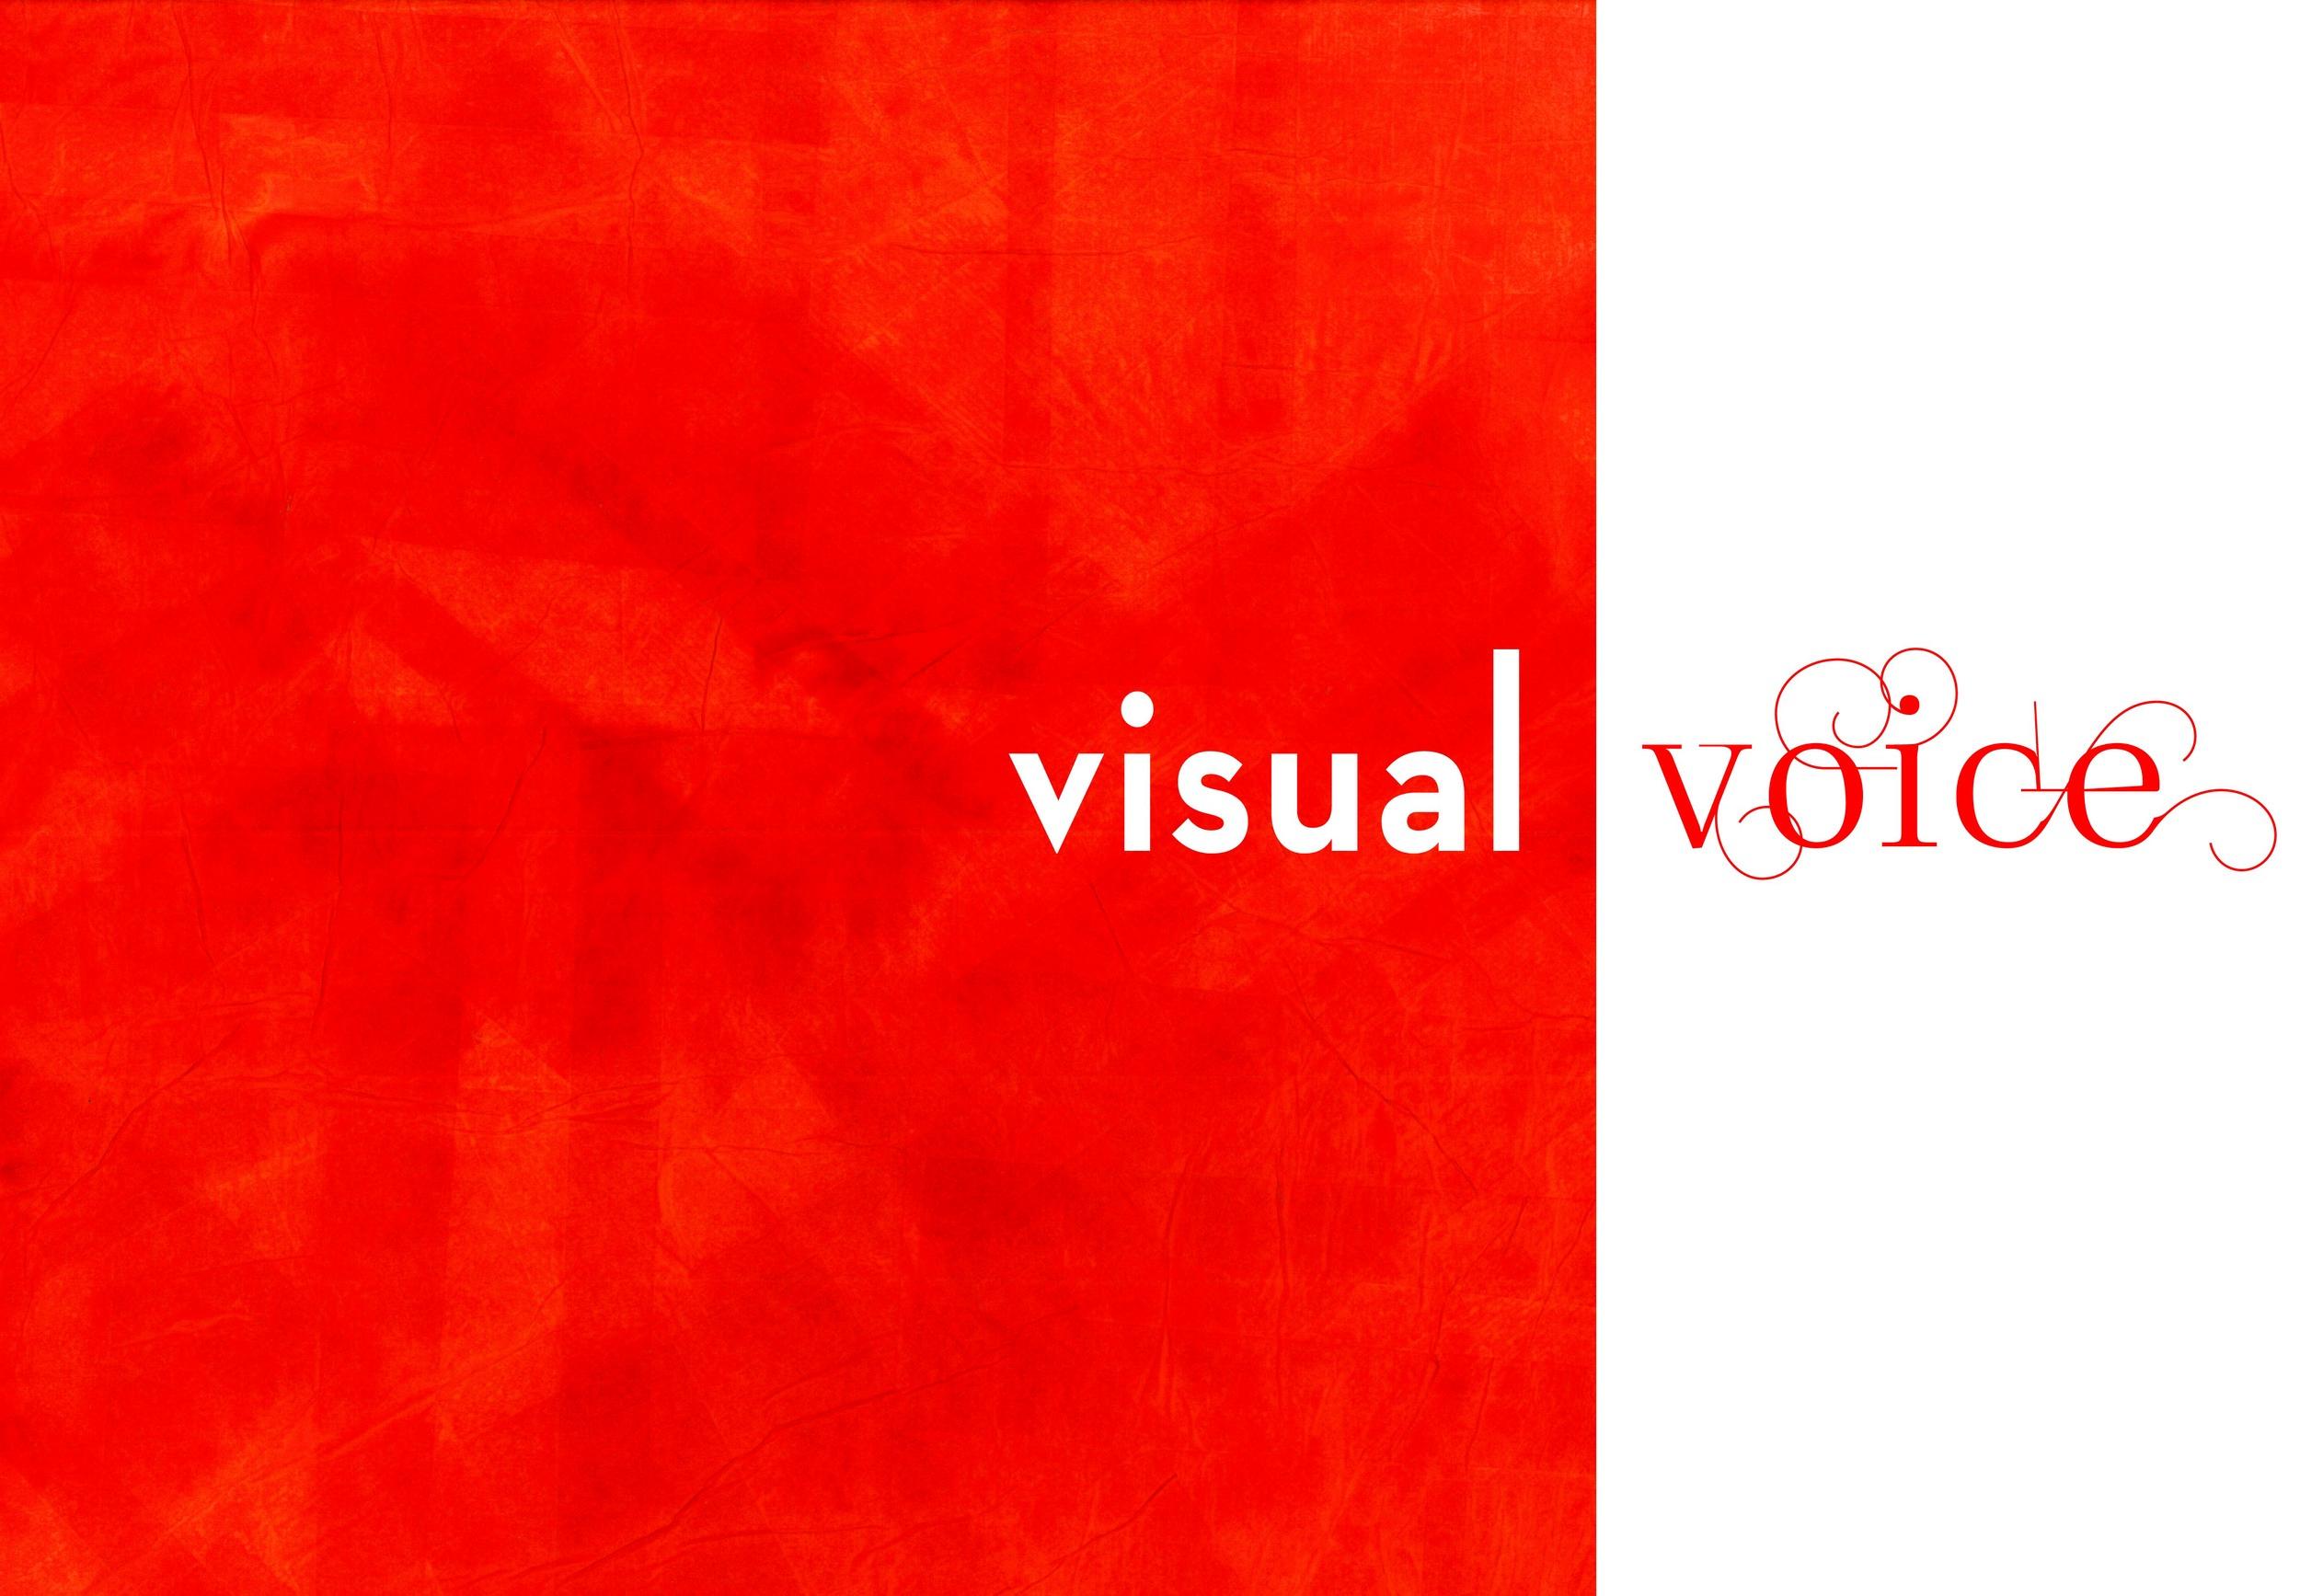 visual voice 2.jpg